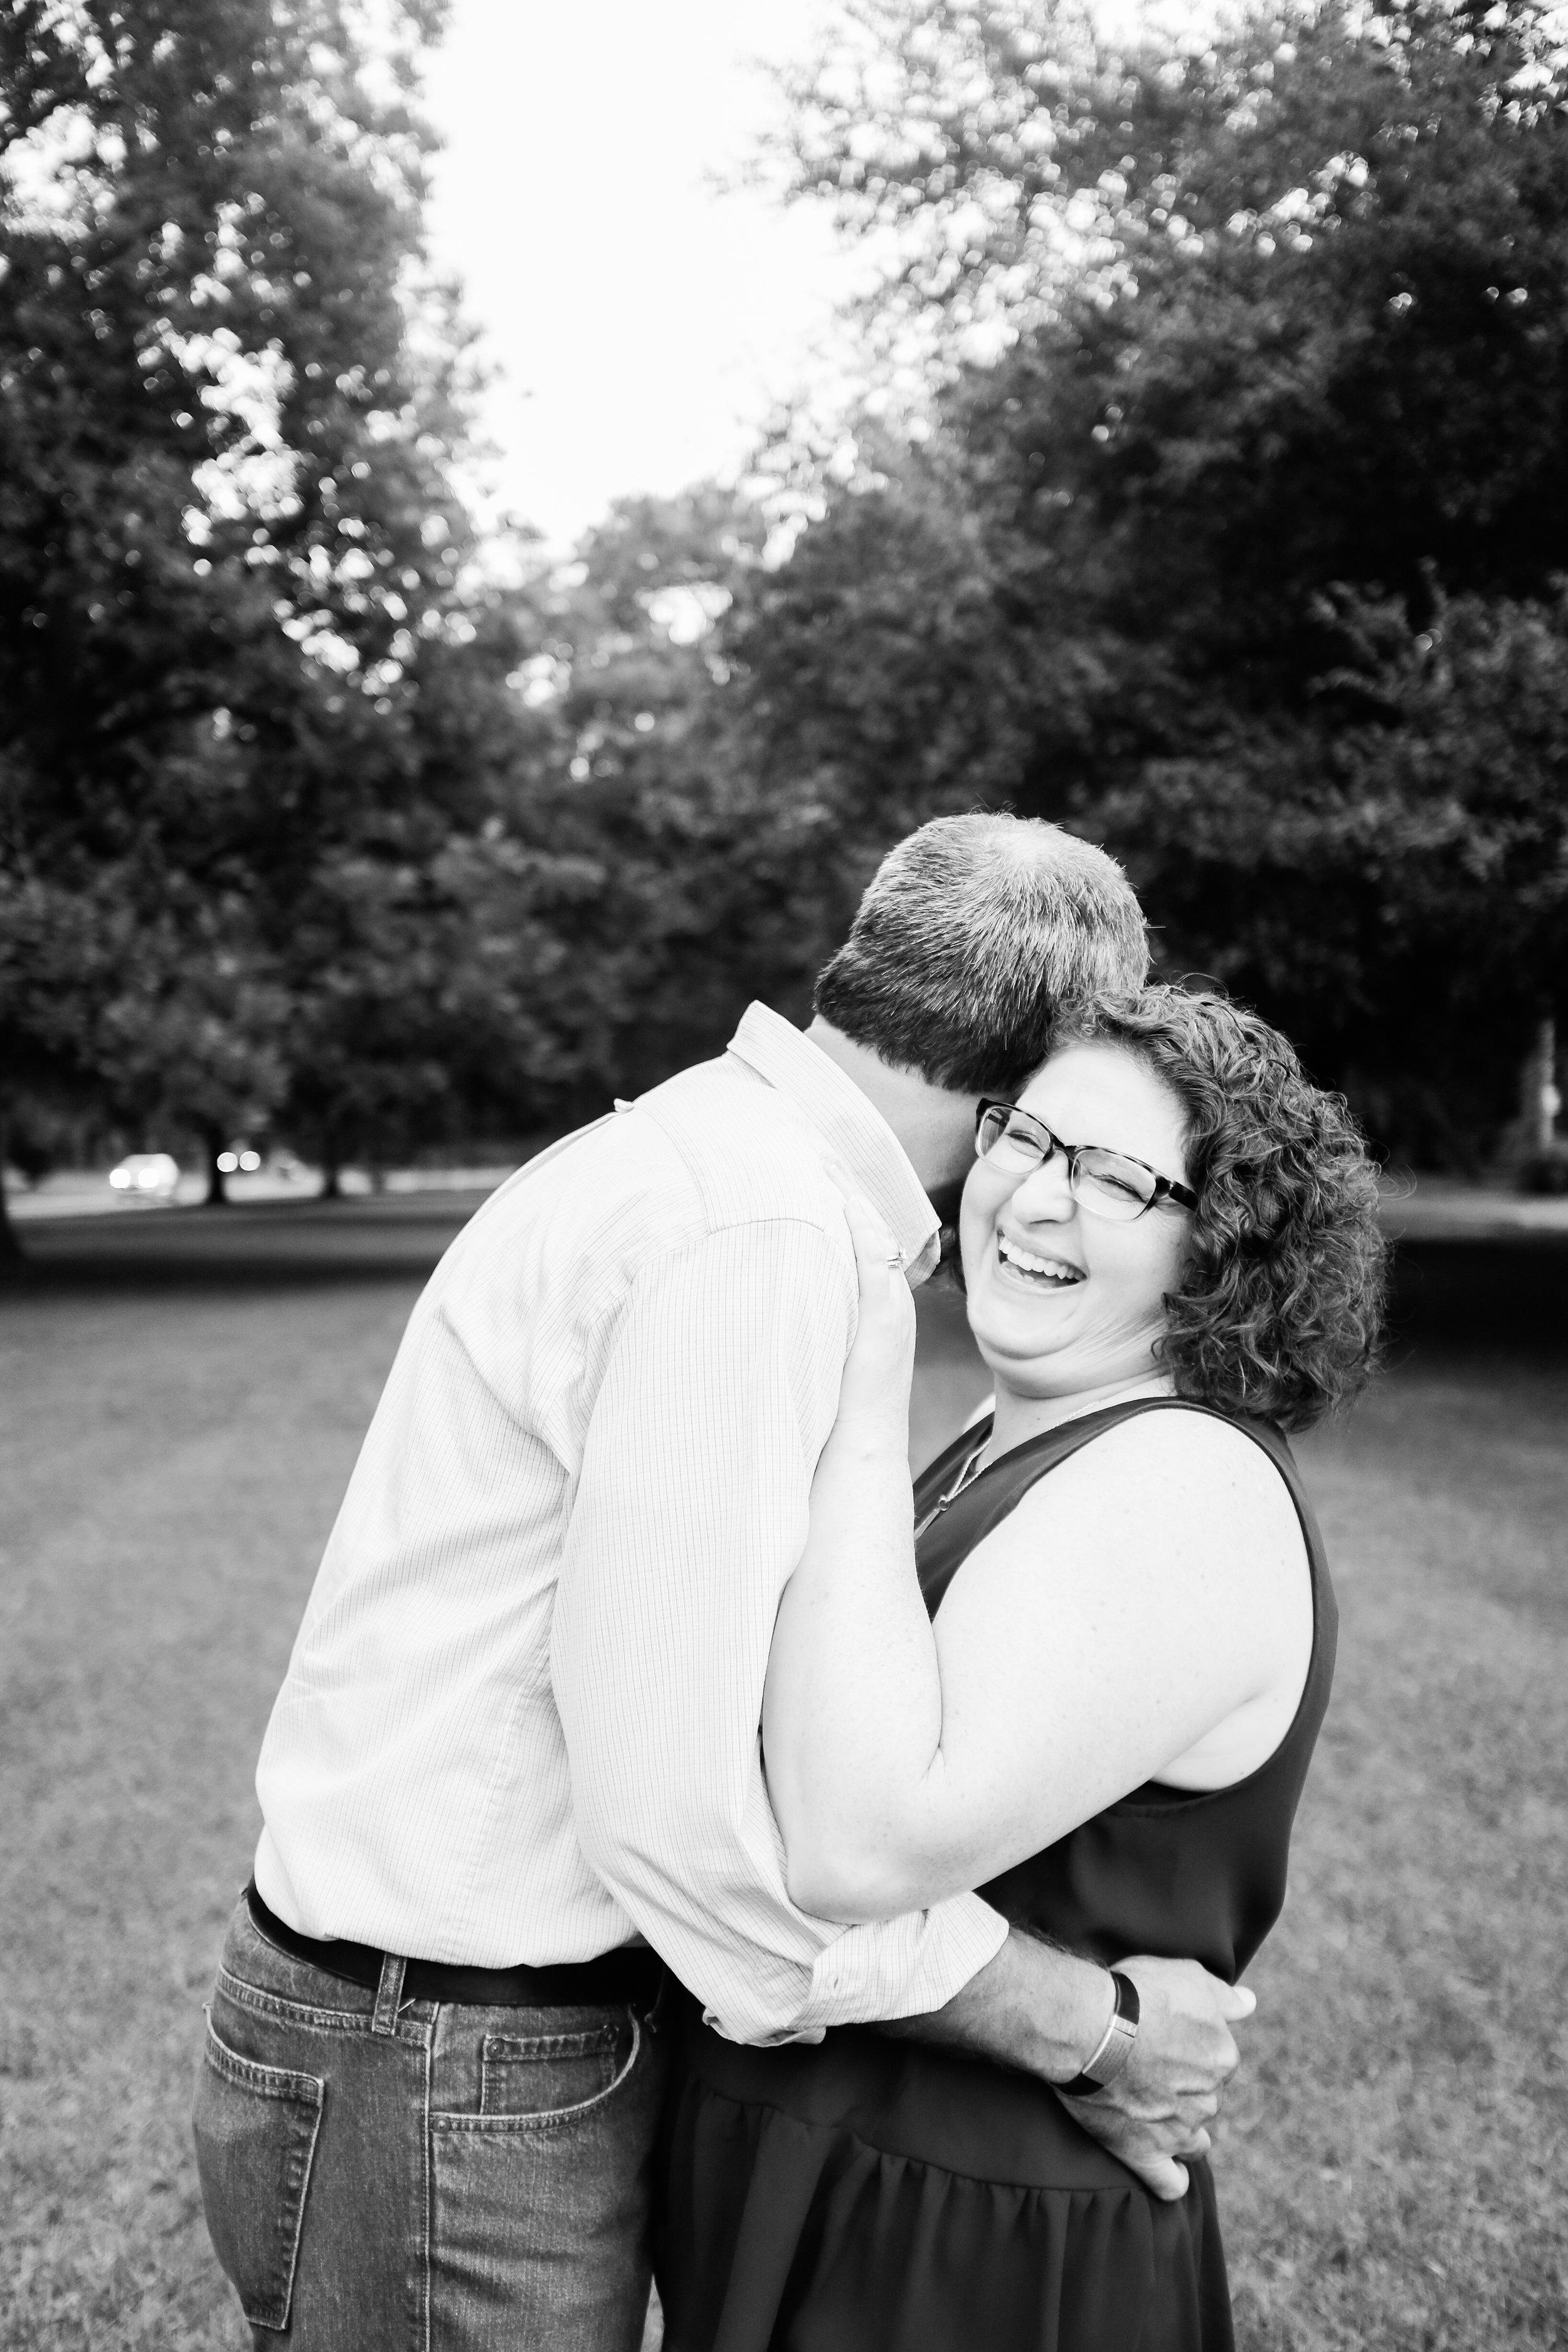 Matty-Drollette-Portraits-Montgomery-Alabama-Photographer-100-3.jpg